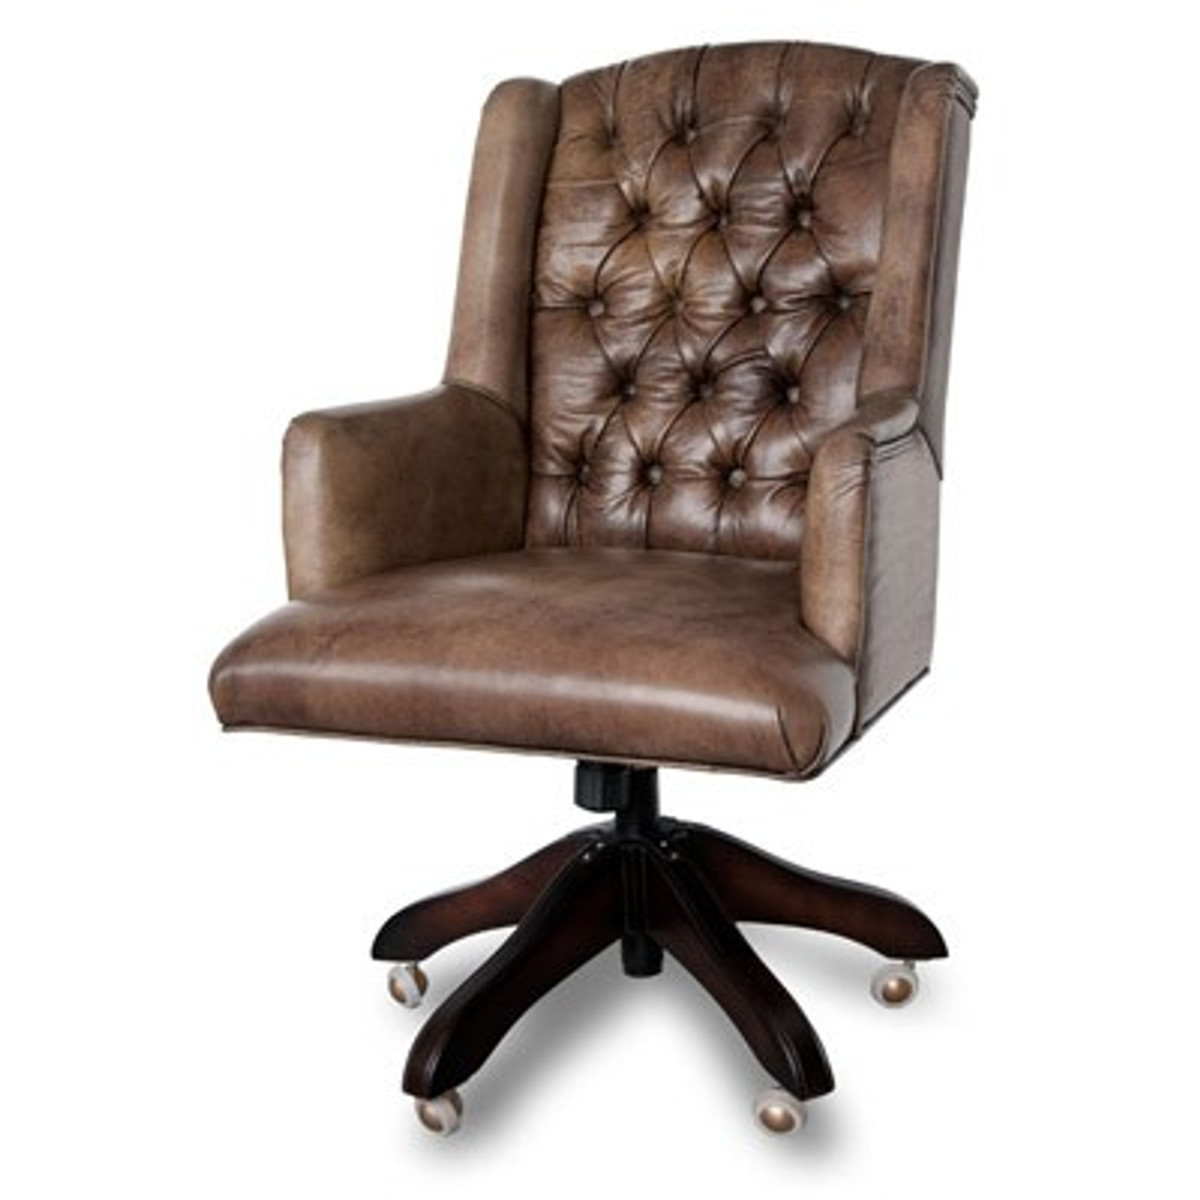 Casa Padrino Luxus Echtleder Chefsessel Buro Stuhl Medium Braun